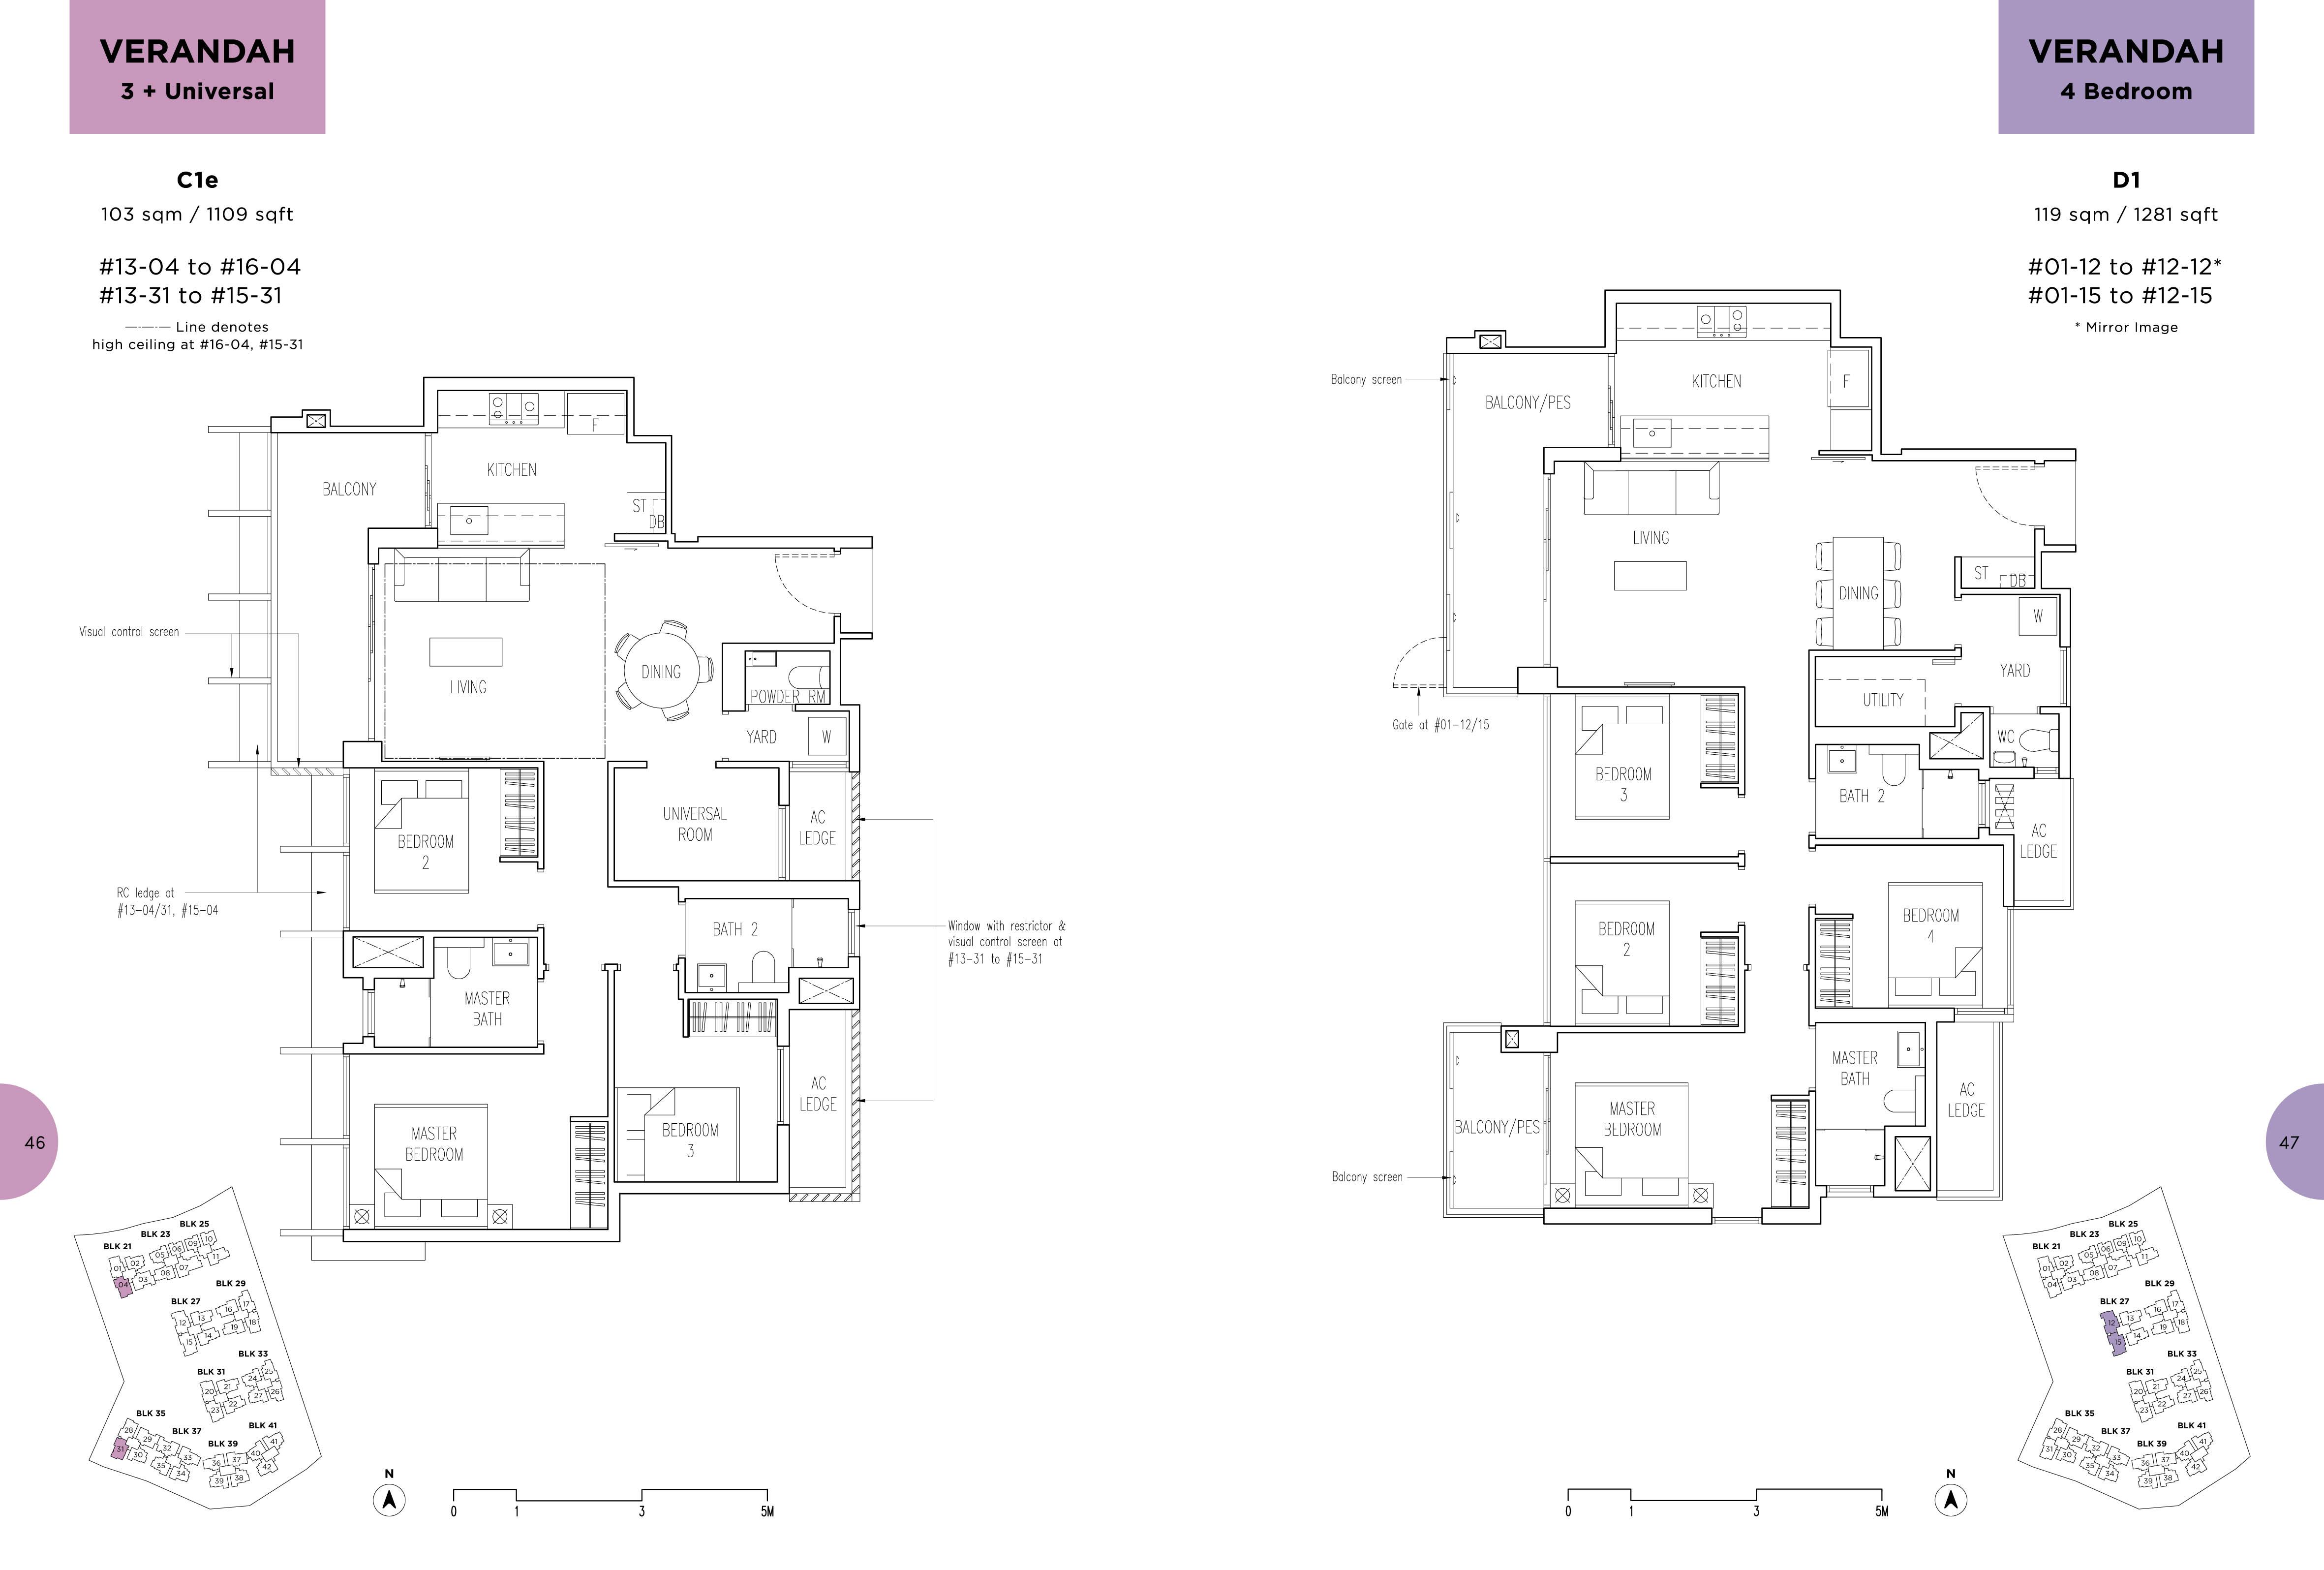 verandah_Floorplan-8